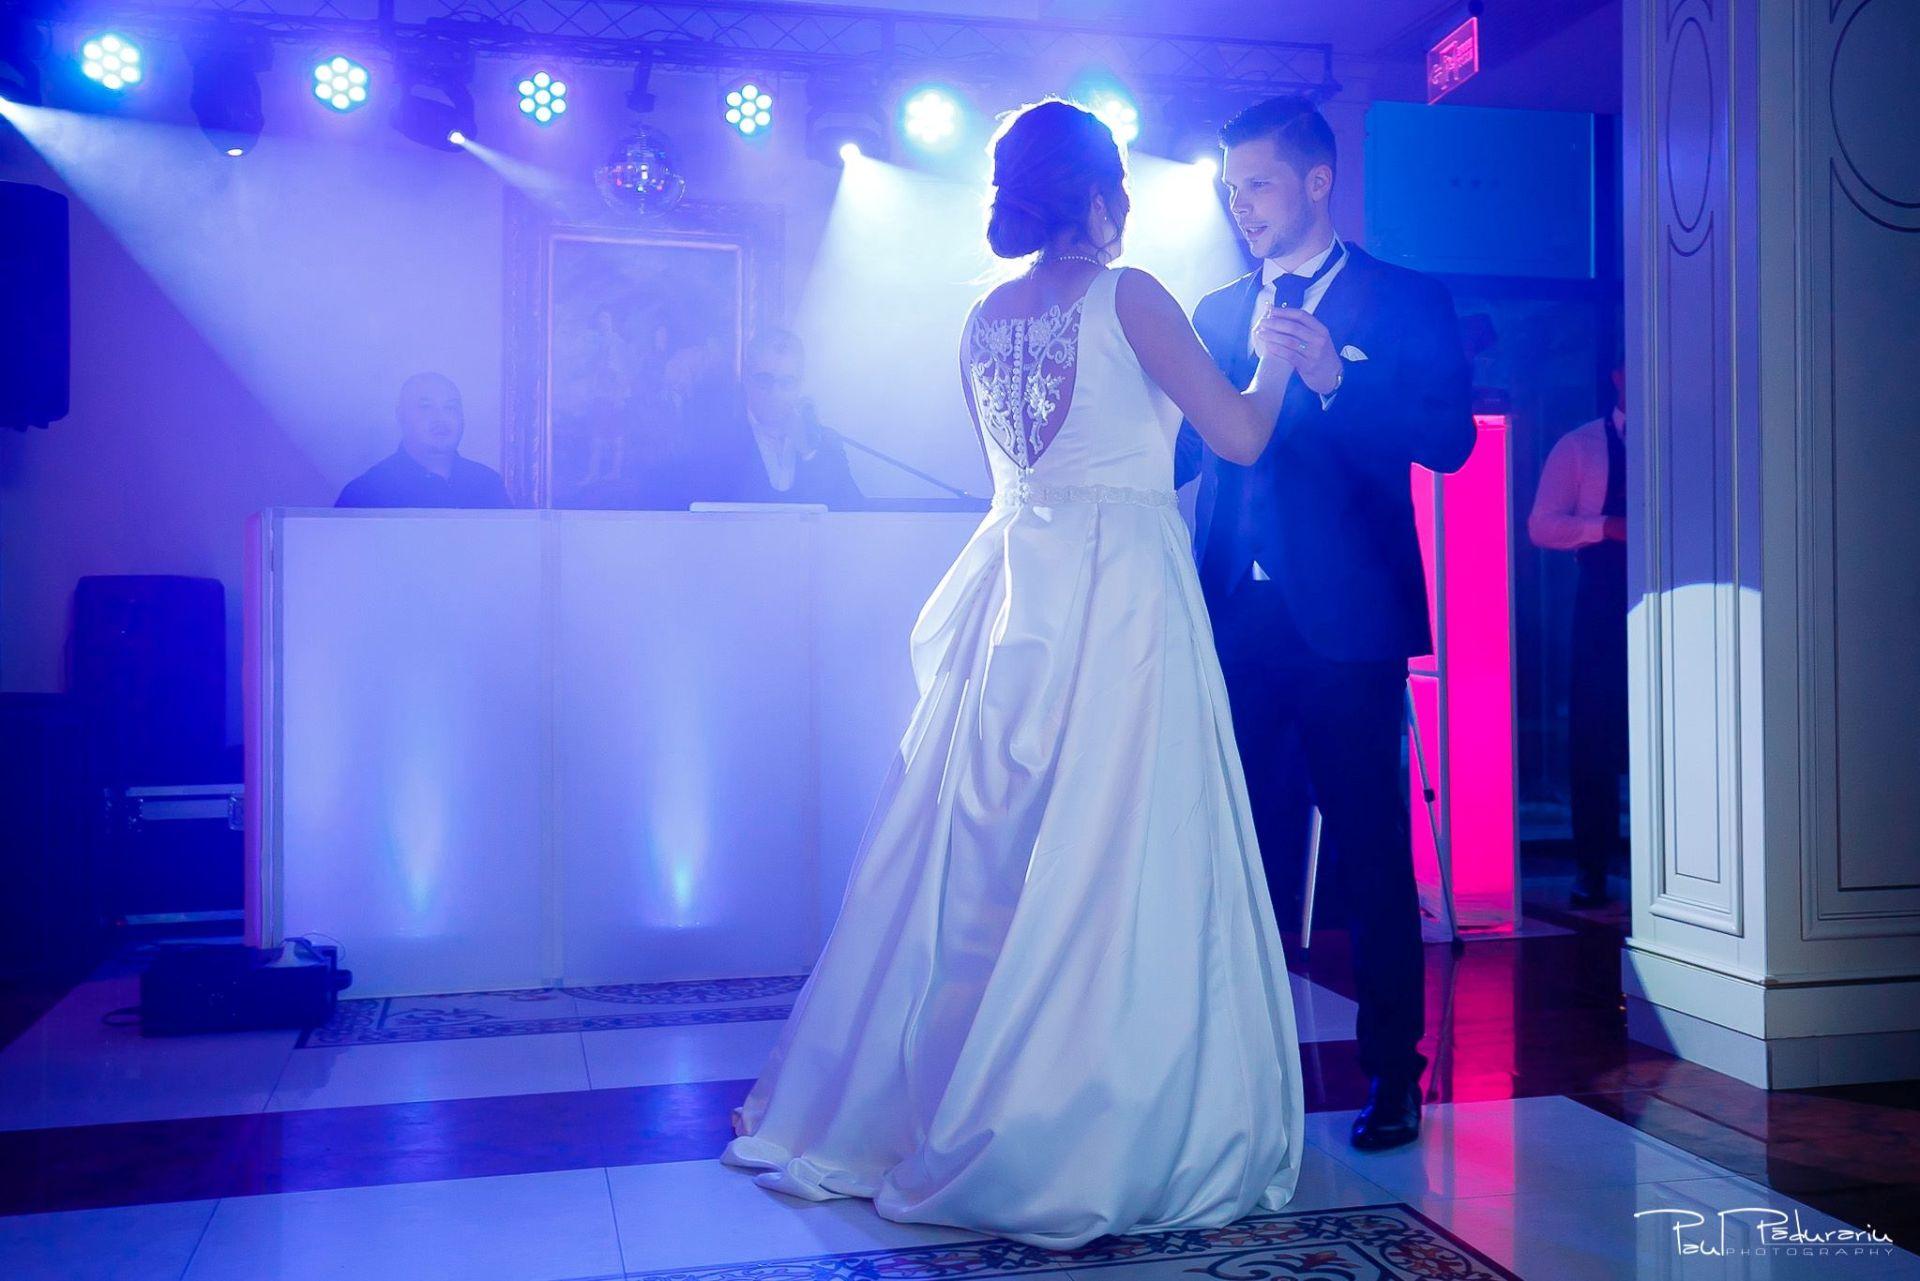 Alex si Natalia nunta Sala Regala La Castel Iasi - fotograf profesionist nunta iasi Paul Padurariu 2019 17